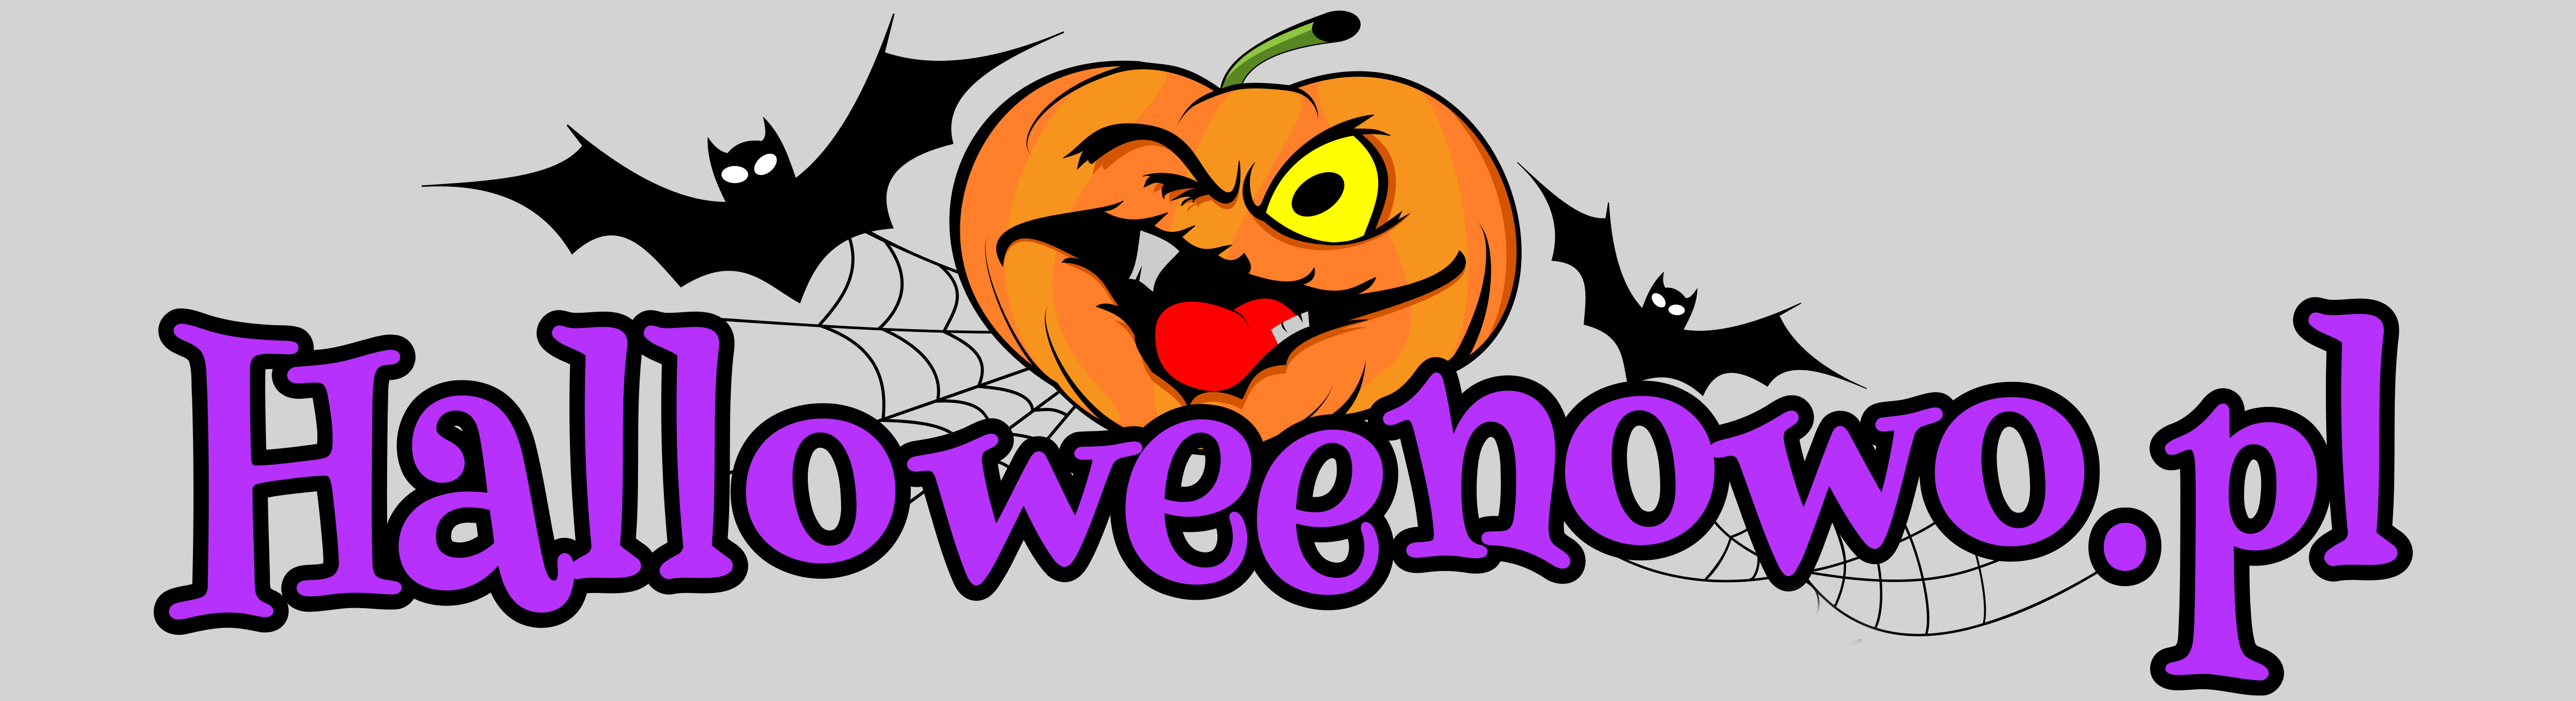 Halloweenowo.pl